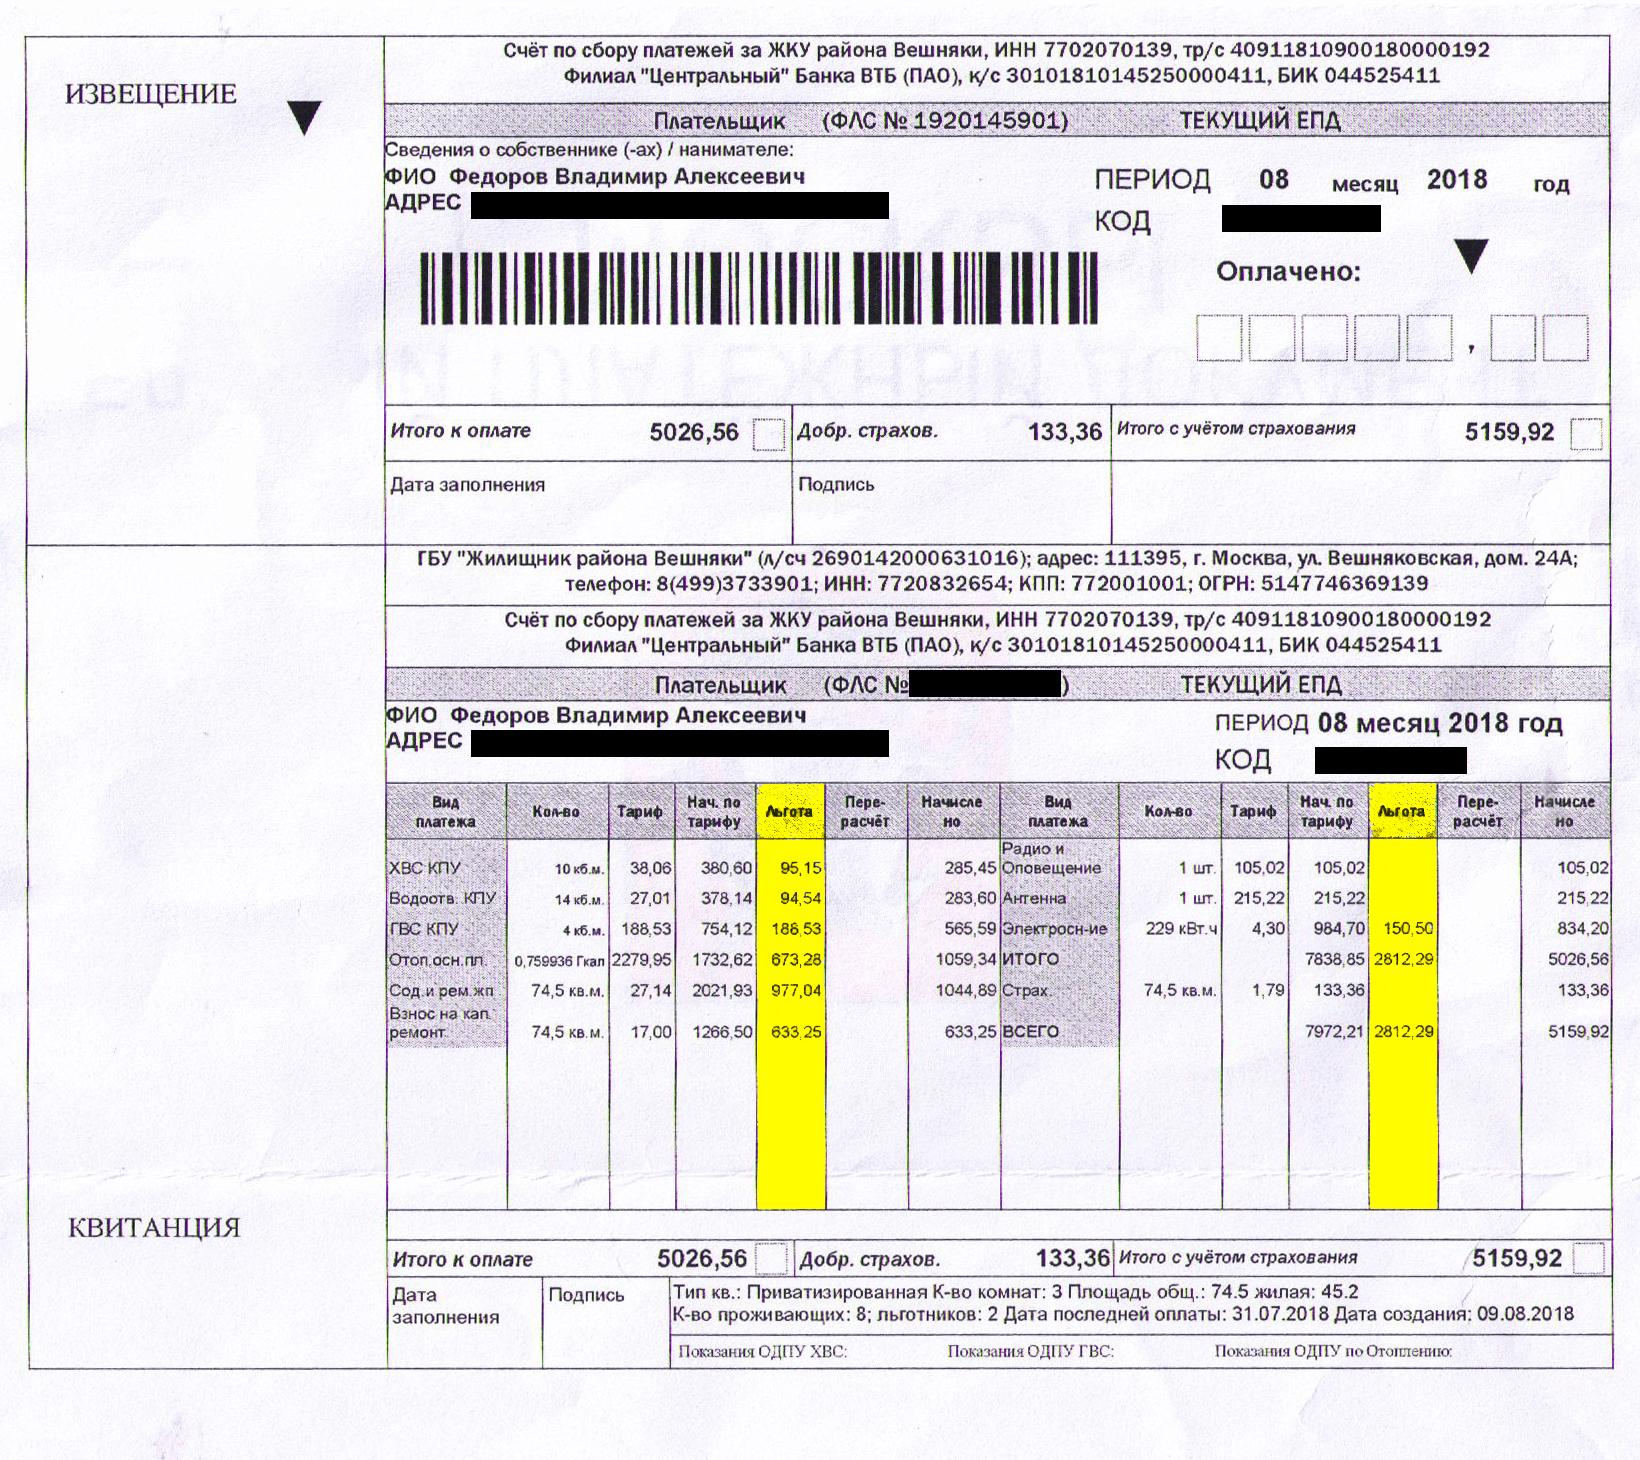 Сумма скидки на оплату ЖКХ указана в столбце «Льгота»